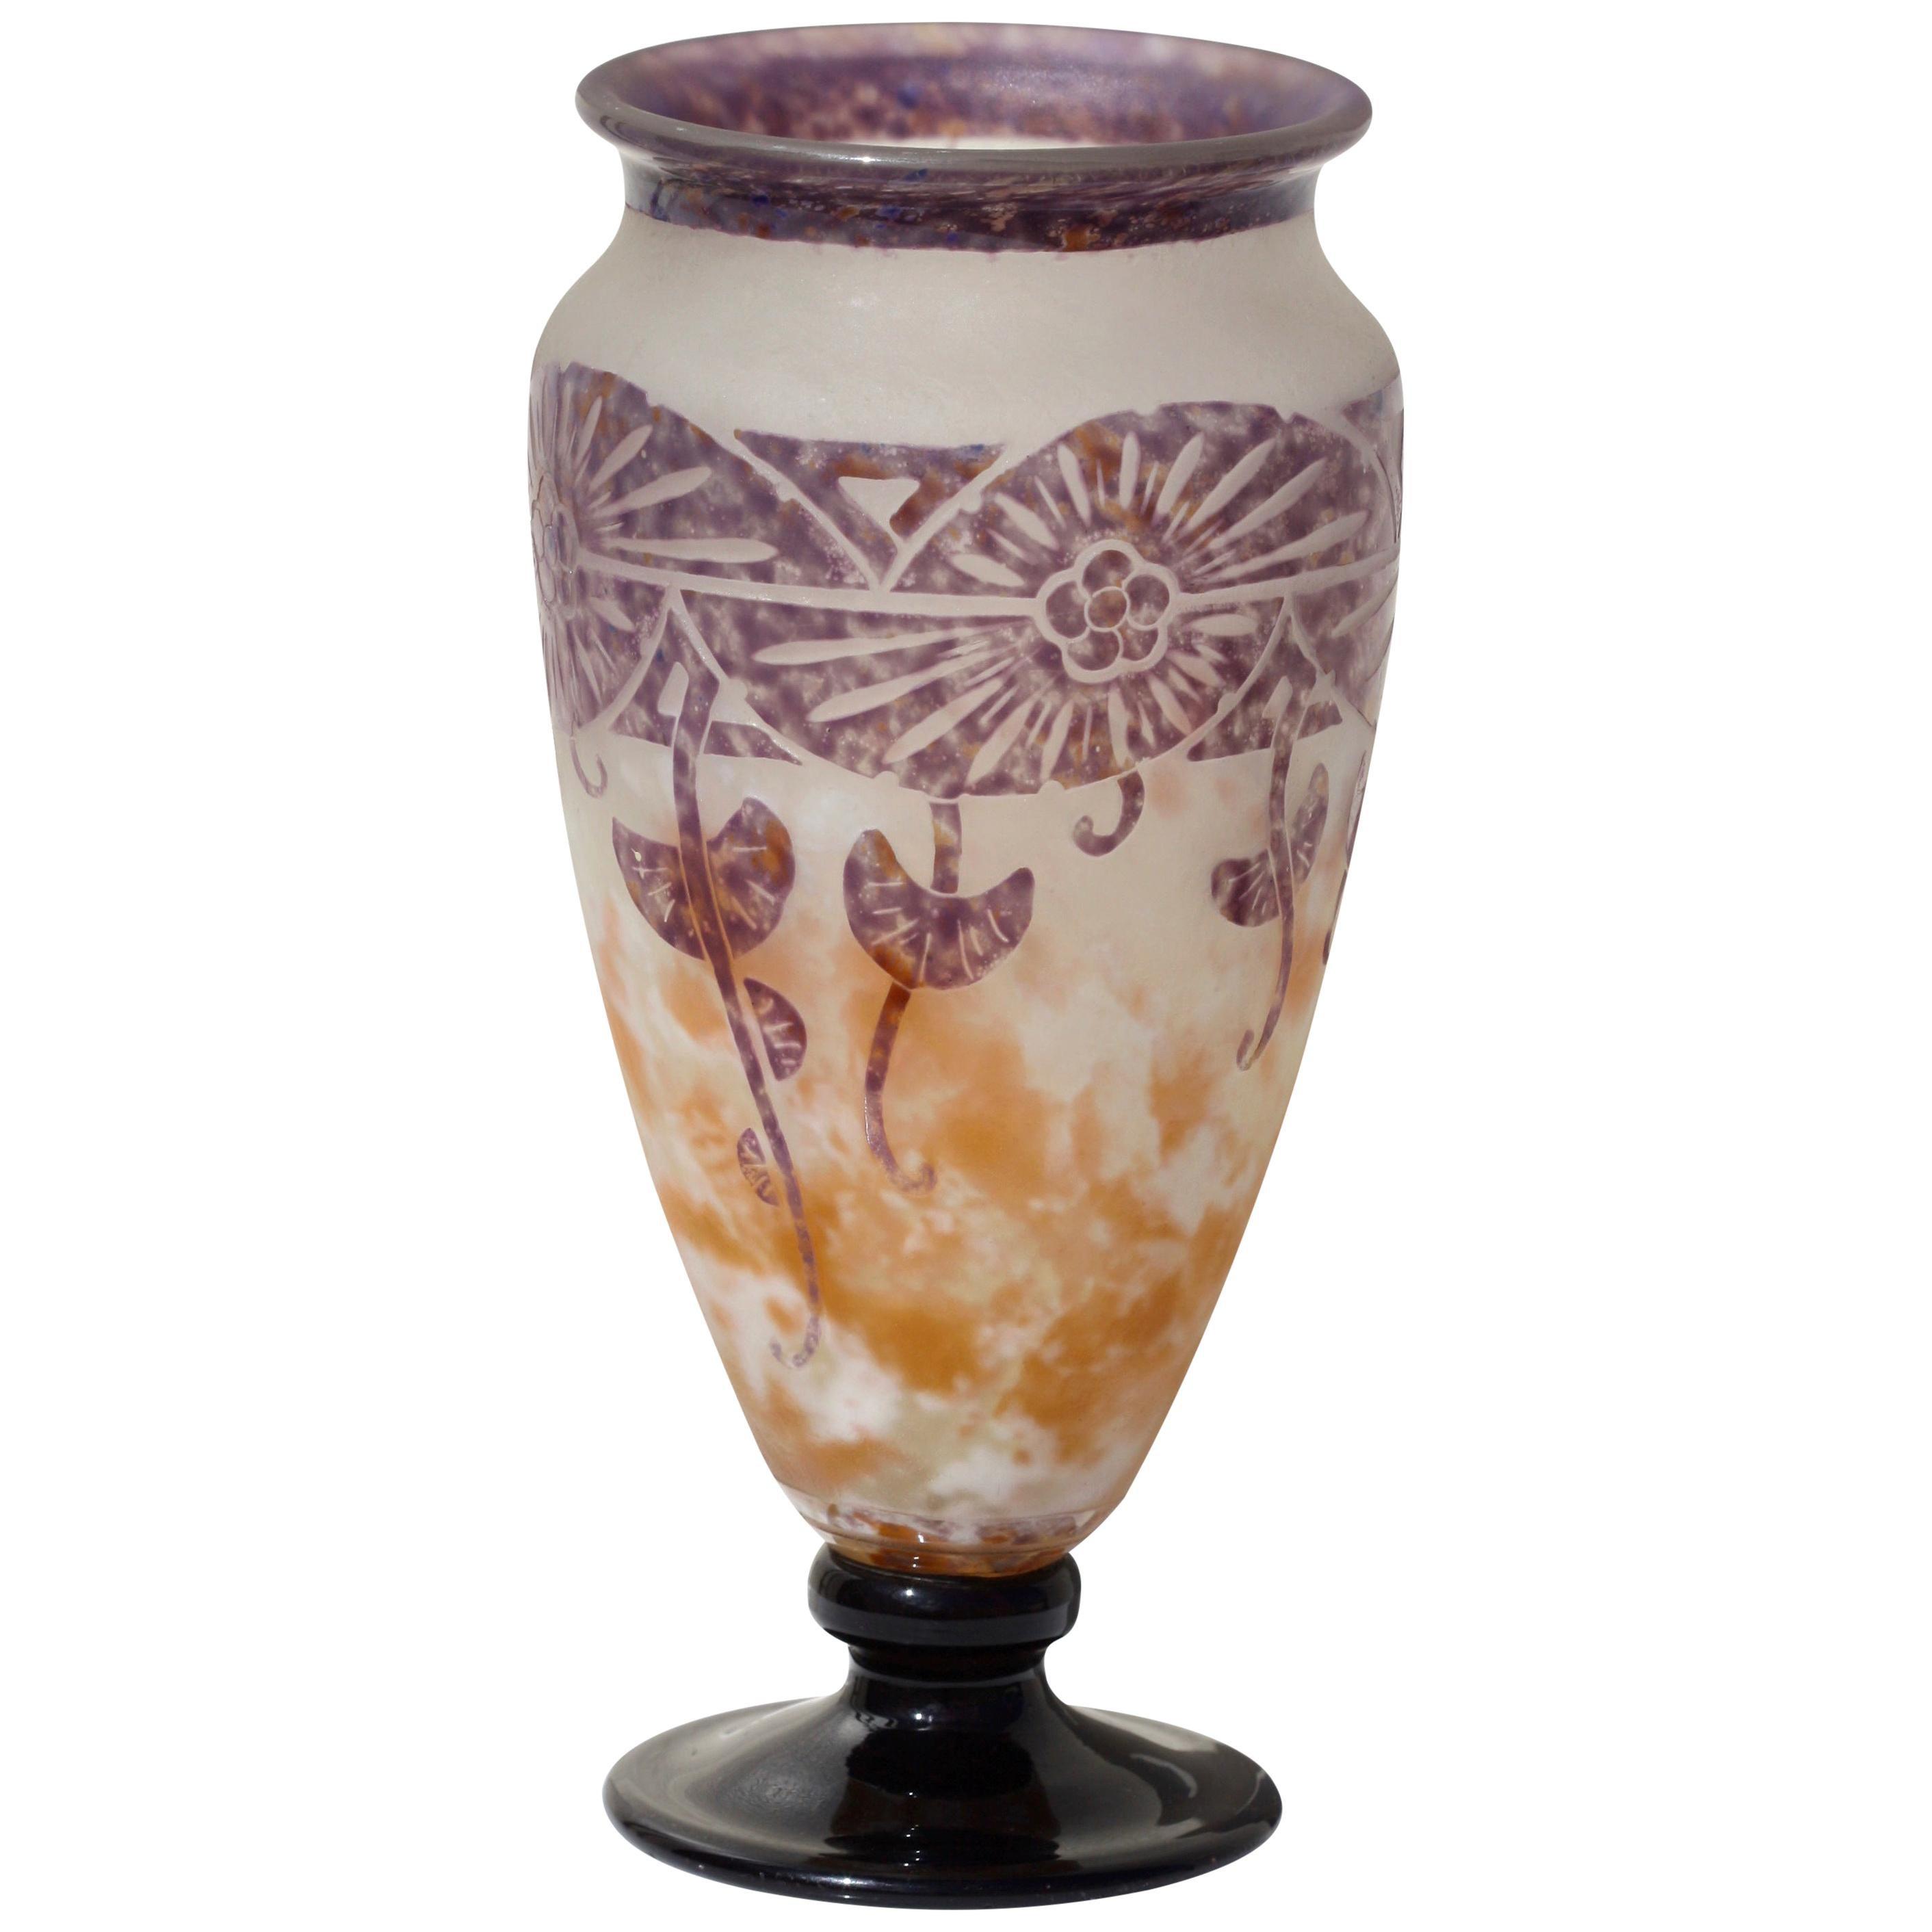 Charles Schneider, Le Verre Francais Cameo Glass Vase